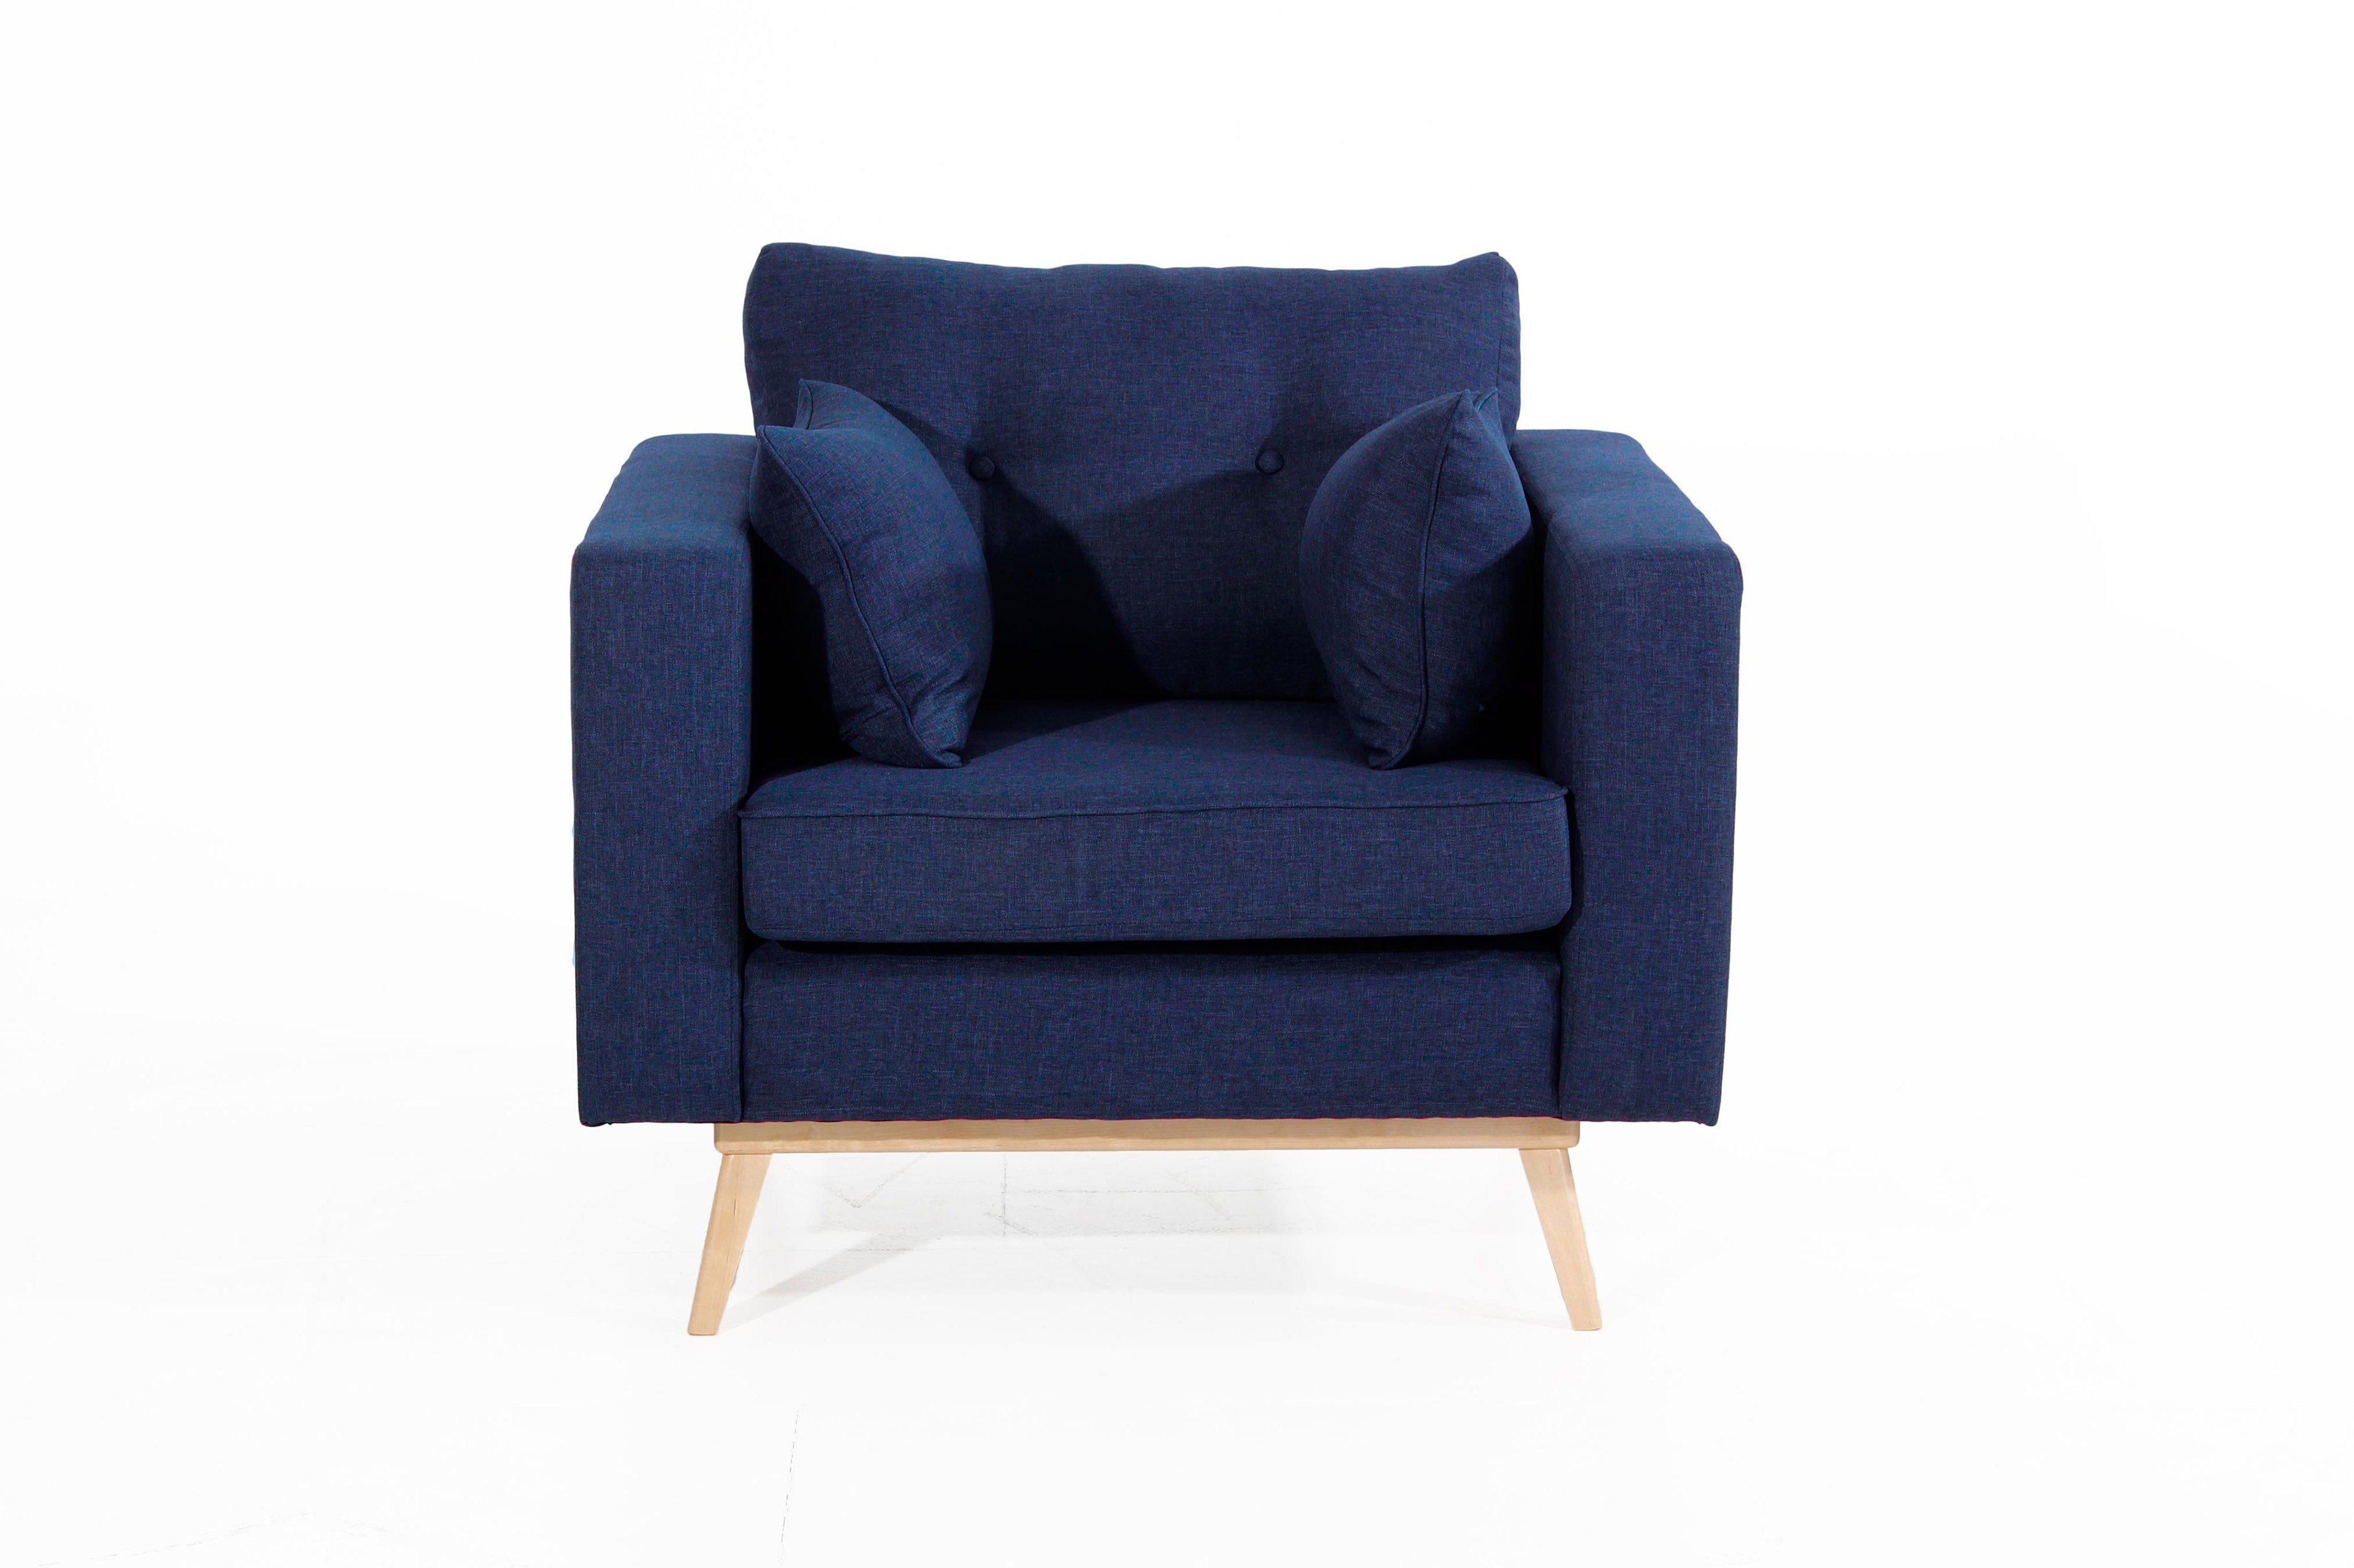 max winzer tomme polstergarnitur dunkelblau m bel letz ihr online shop. Black Bedroom Furniture Sets. Home Design Ideas